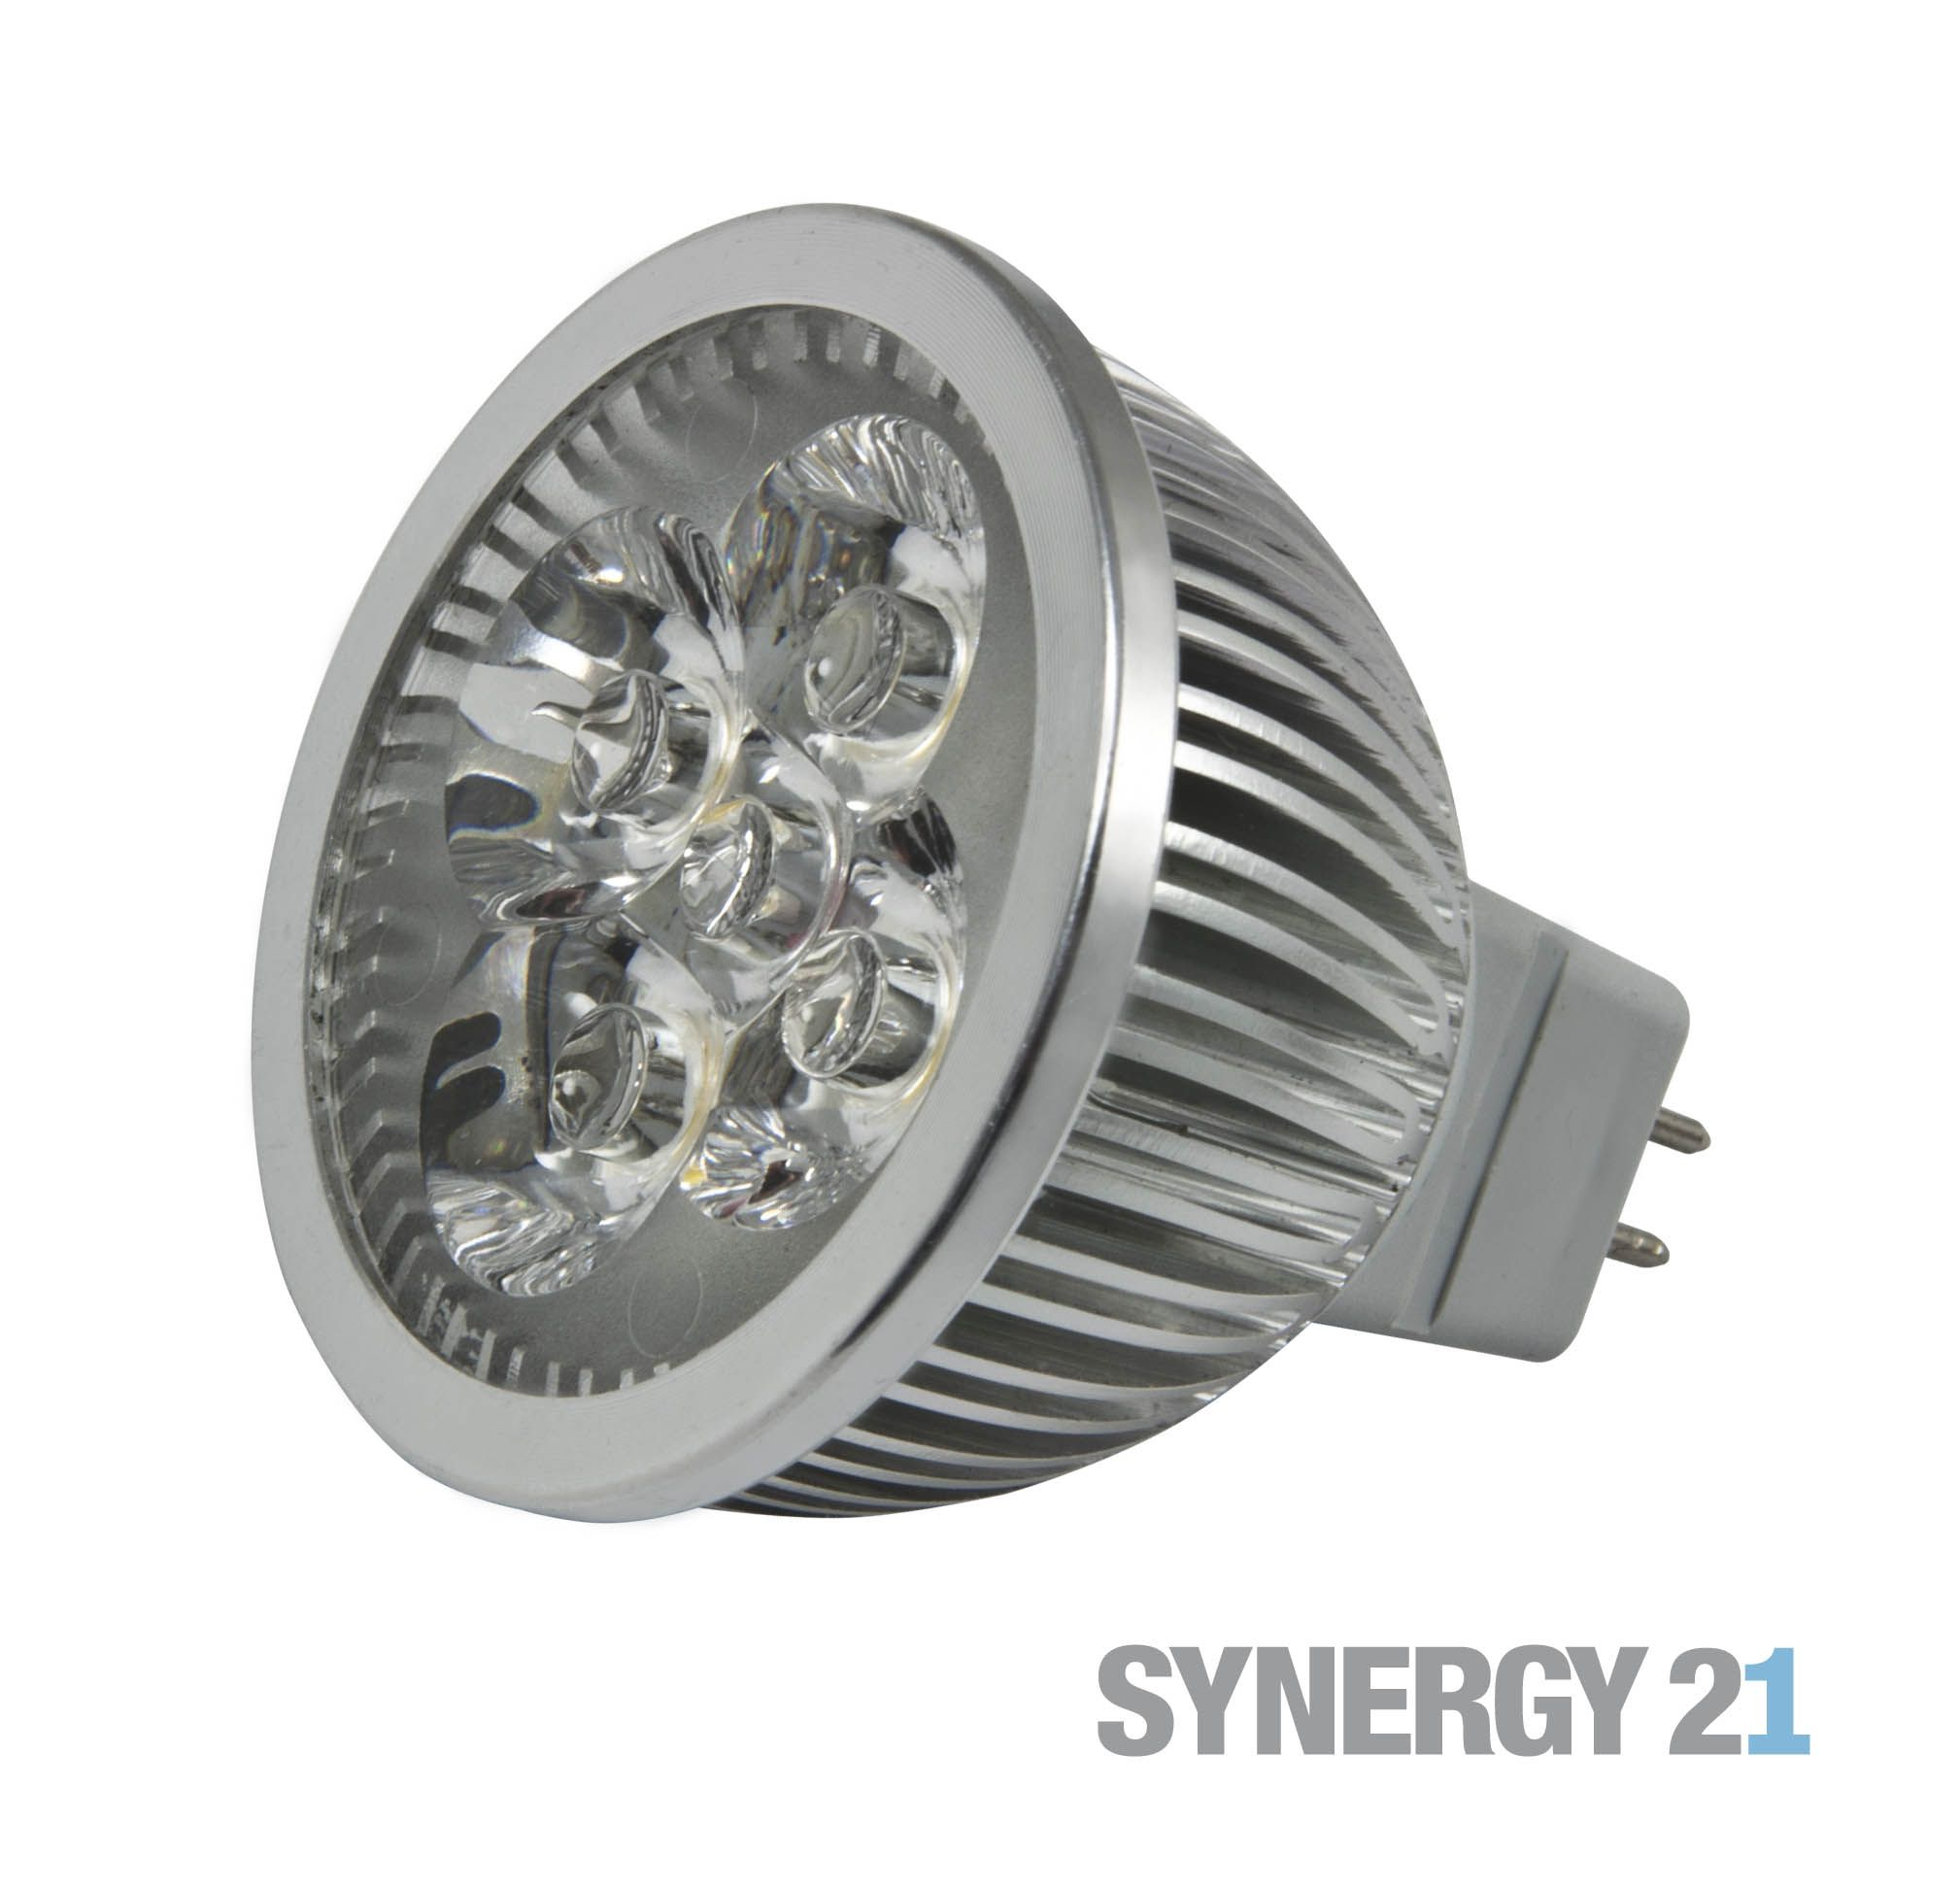 allnet synergy21 retrofit led strahler gx5 3 sockel 4 watt neutralwei. Black Bedroom Furniture Sets. Home Design Ideas